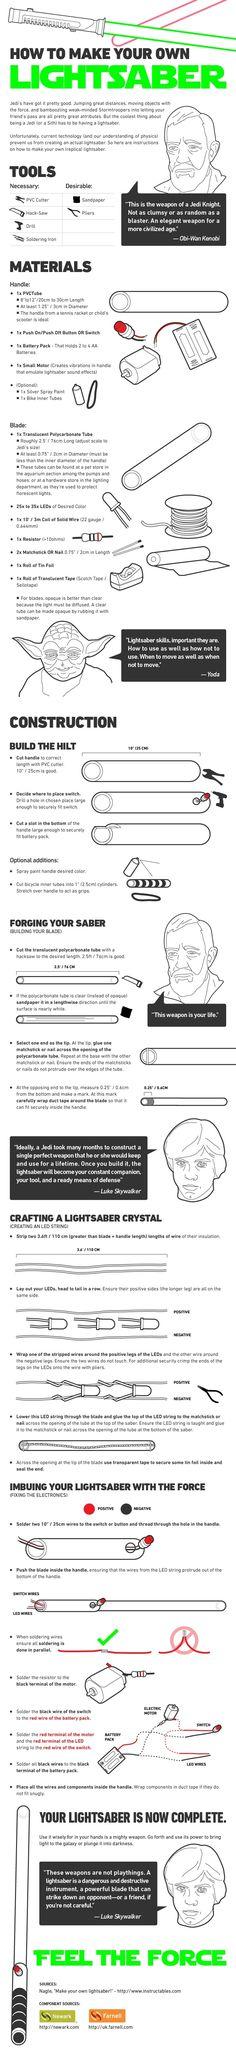 make your own lightsaber   How To Make Your Own DIY Lightsaber